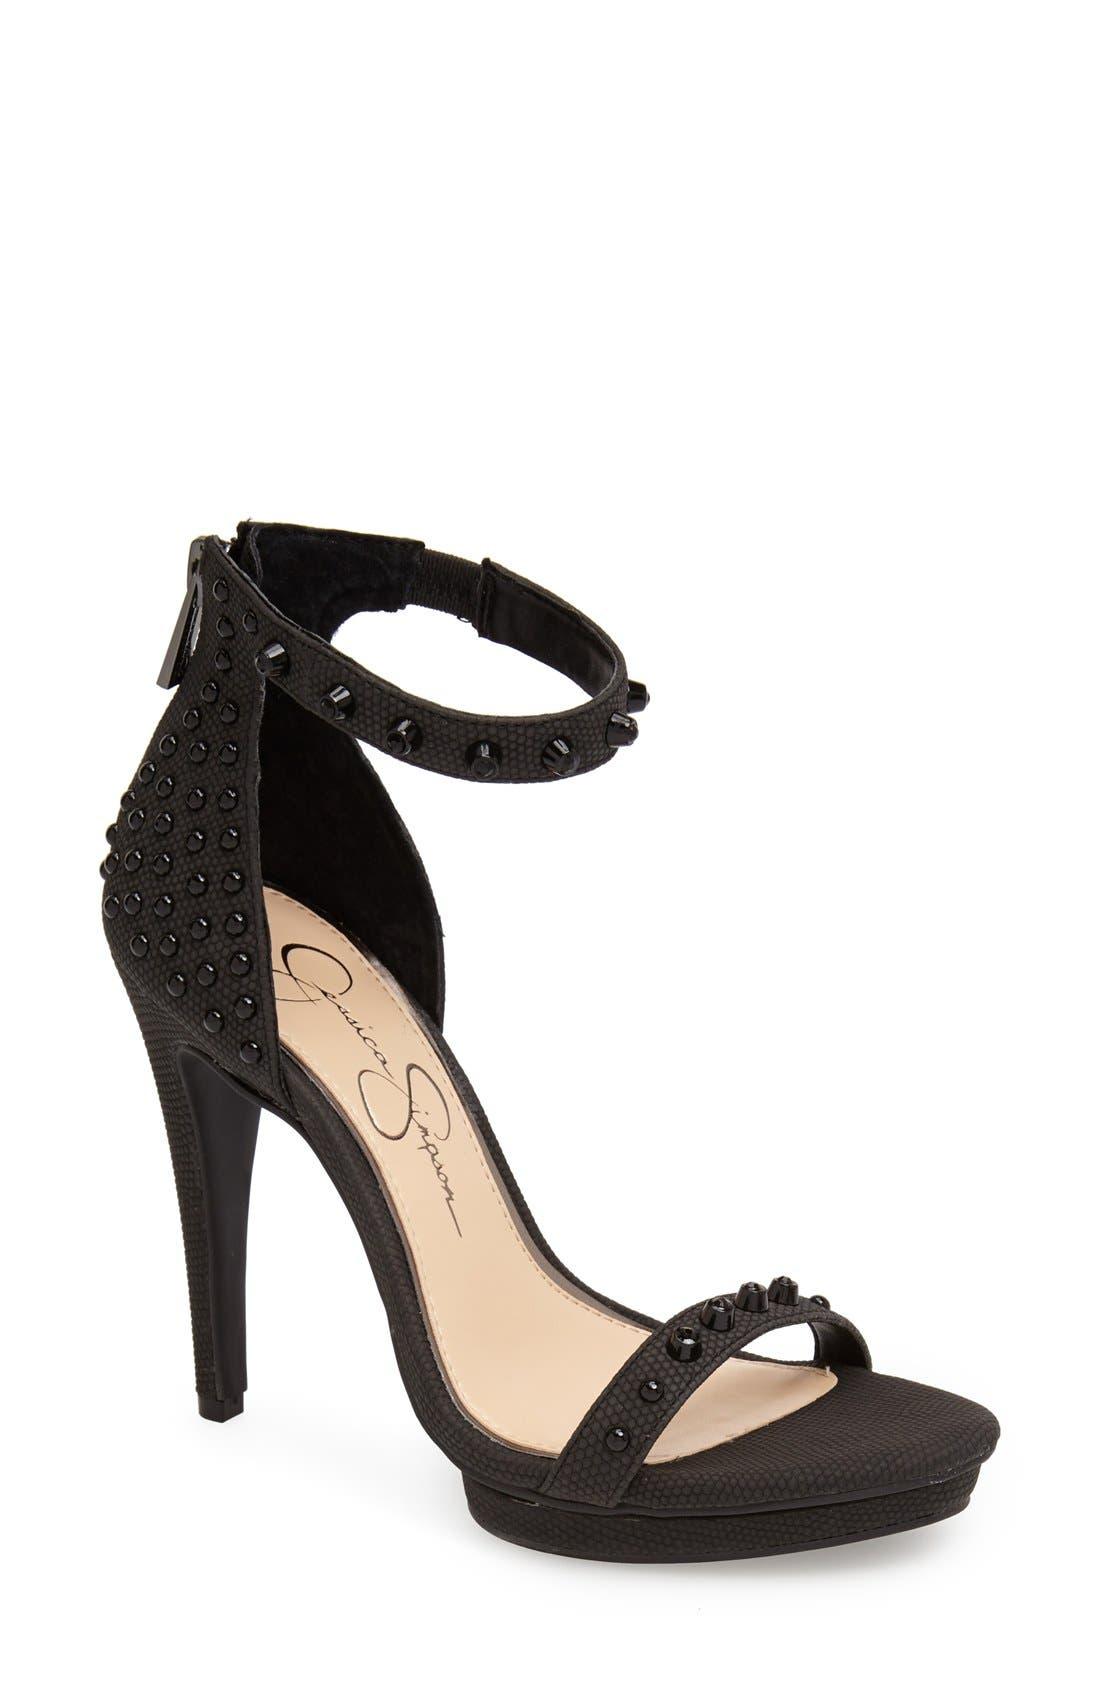 Main Image - Jessica Simpson 'Faralie' Sandal (Women)